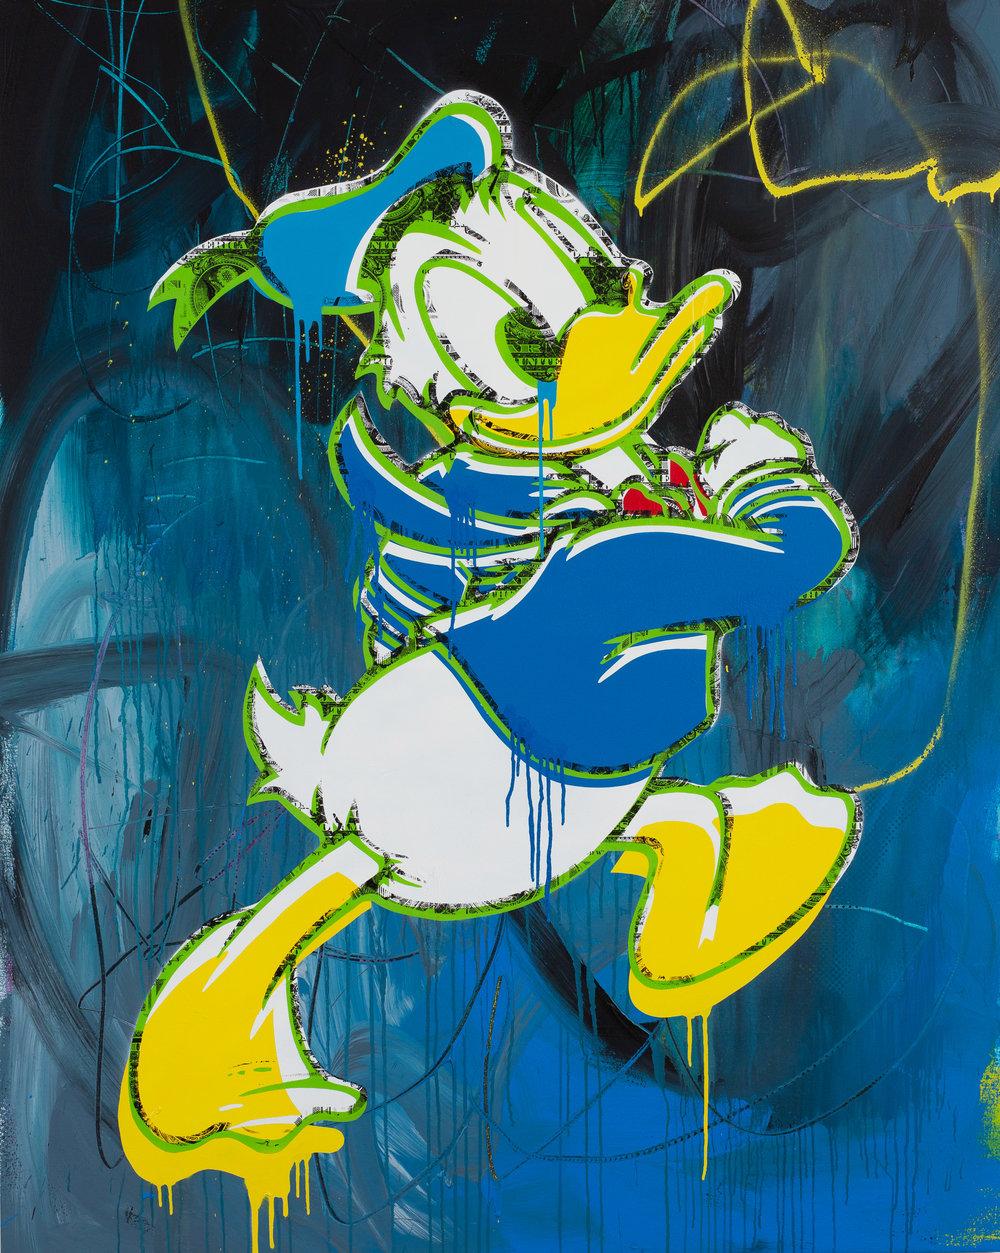 Popaganda-Duck-Acrylic_Spray_paint_screenprint_emulsion_varnish_on_canvas_150cm-x-120cm-x4.5cm-£3750.jpg